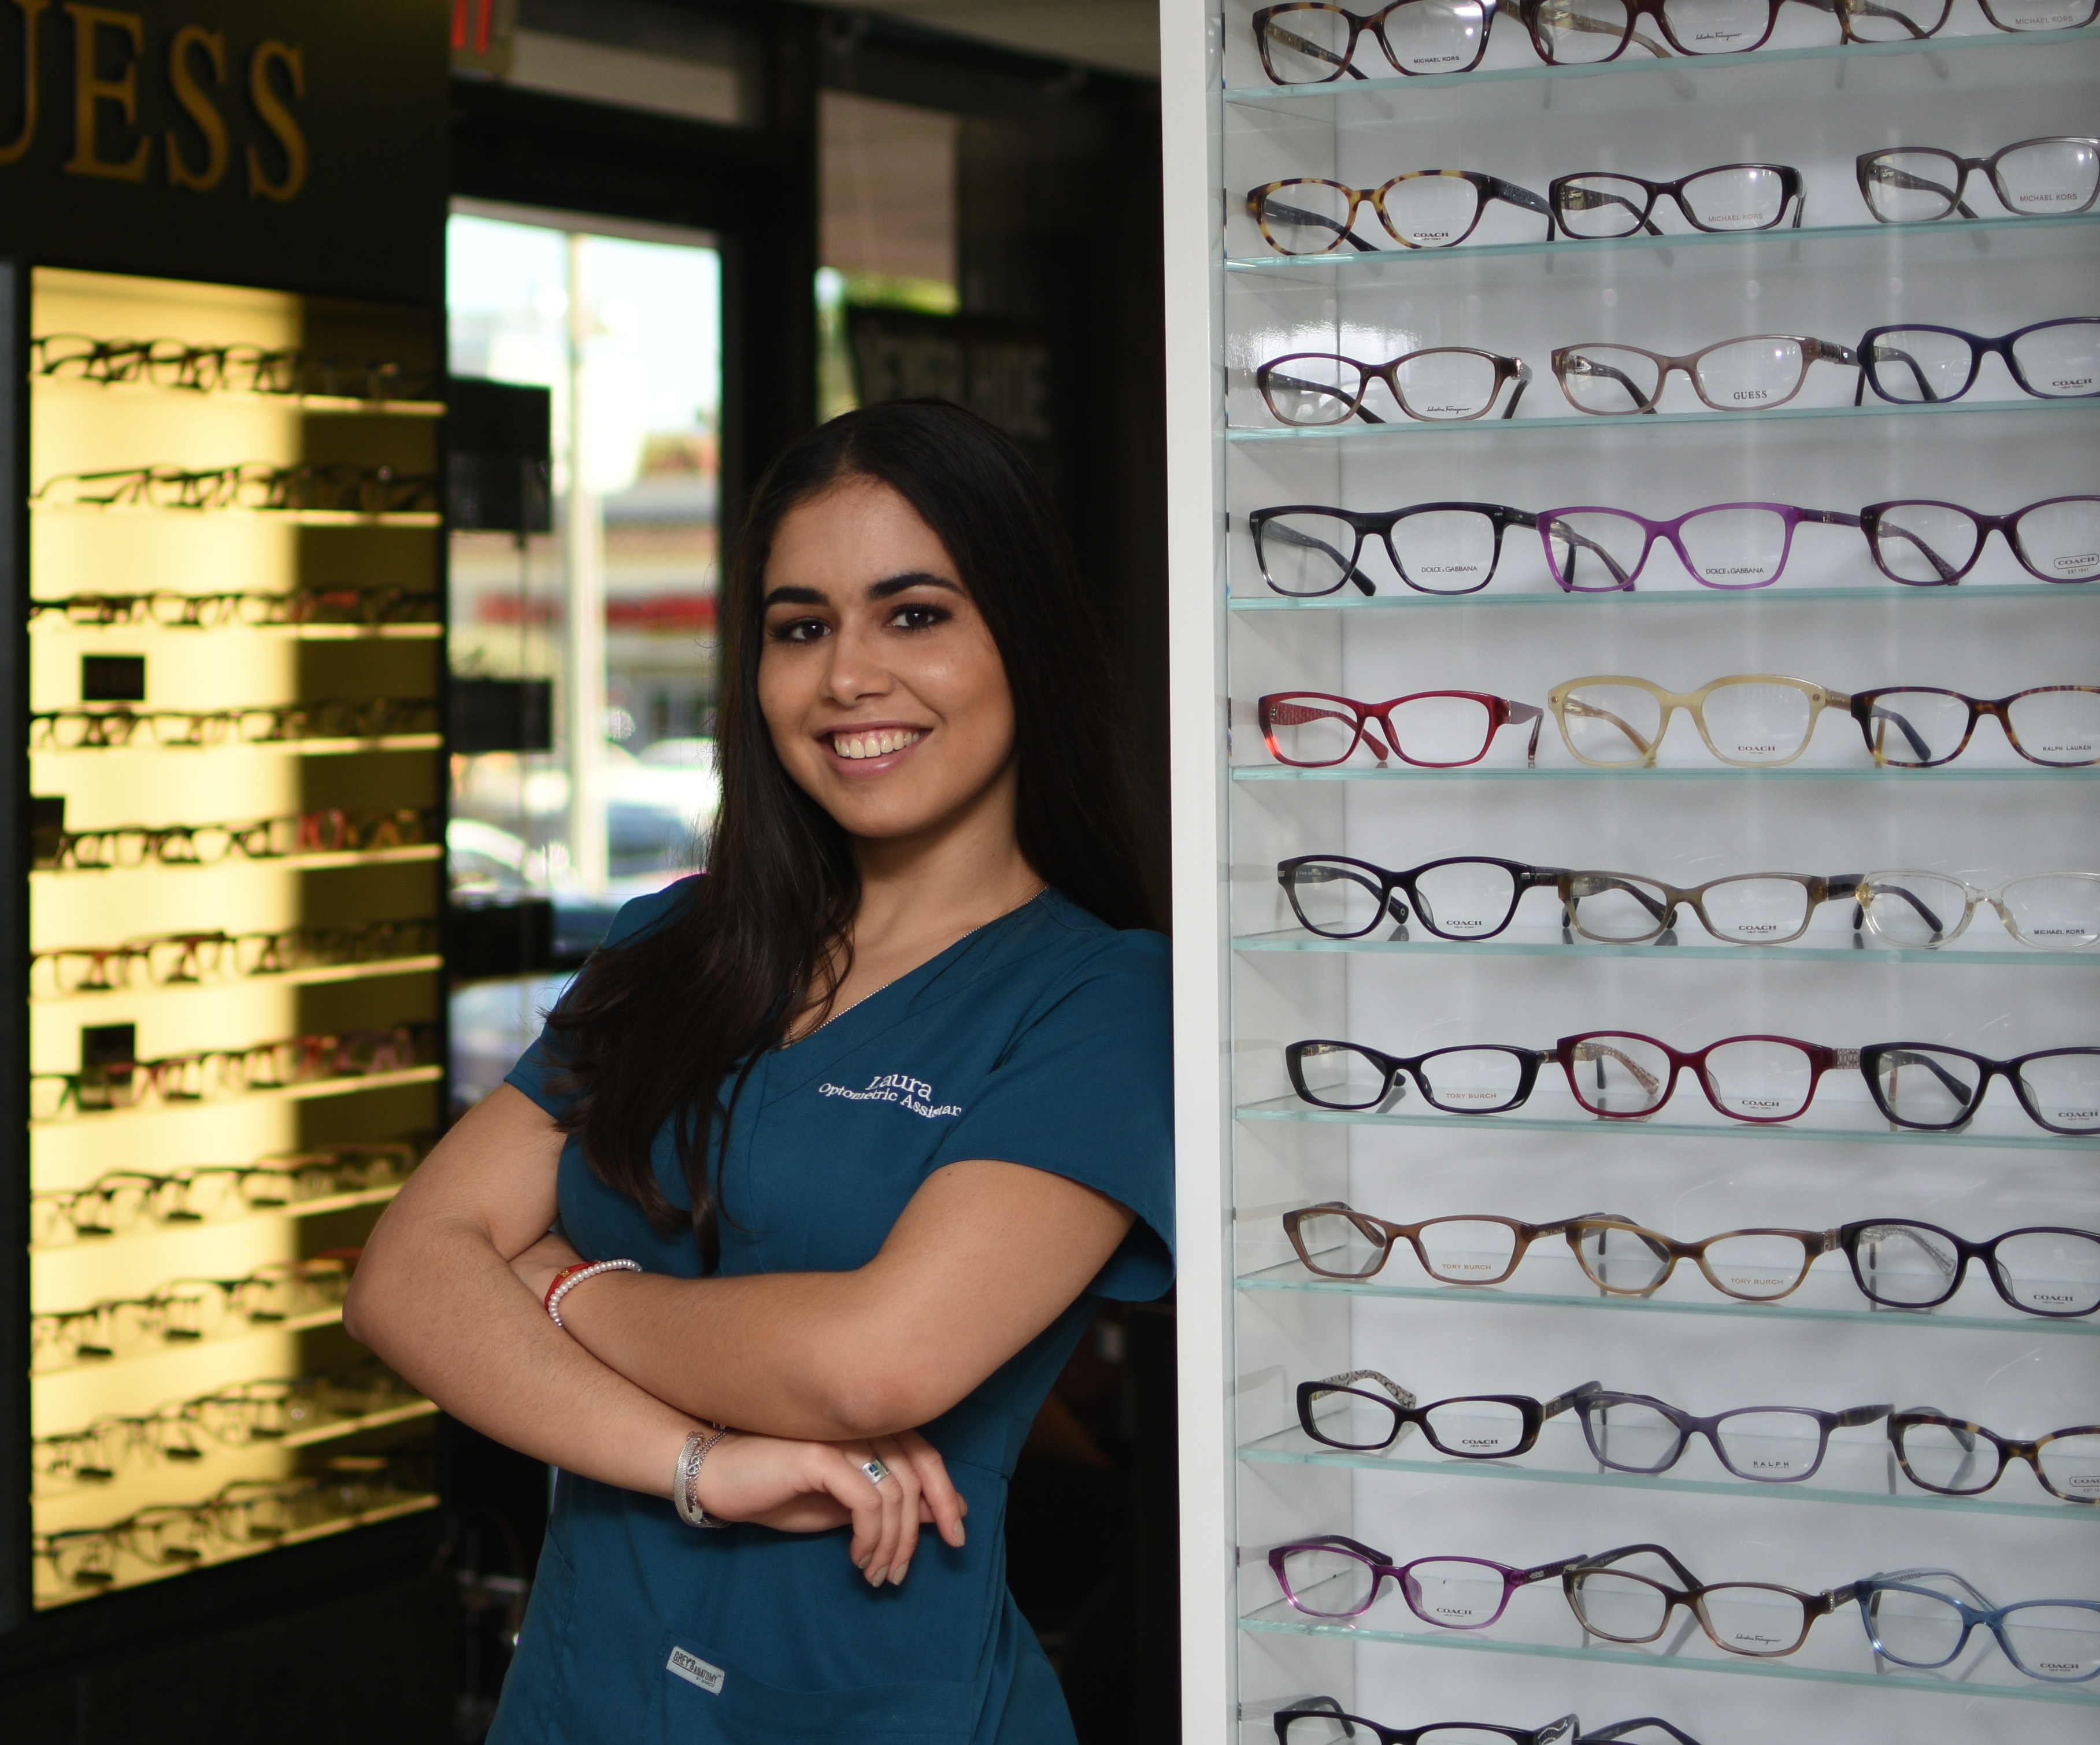 c299286a06bb Laria Eye Care Optometrists and Staff